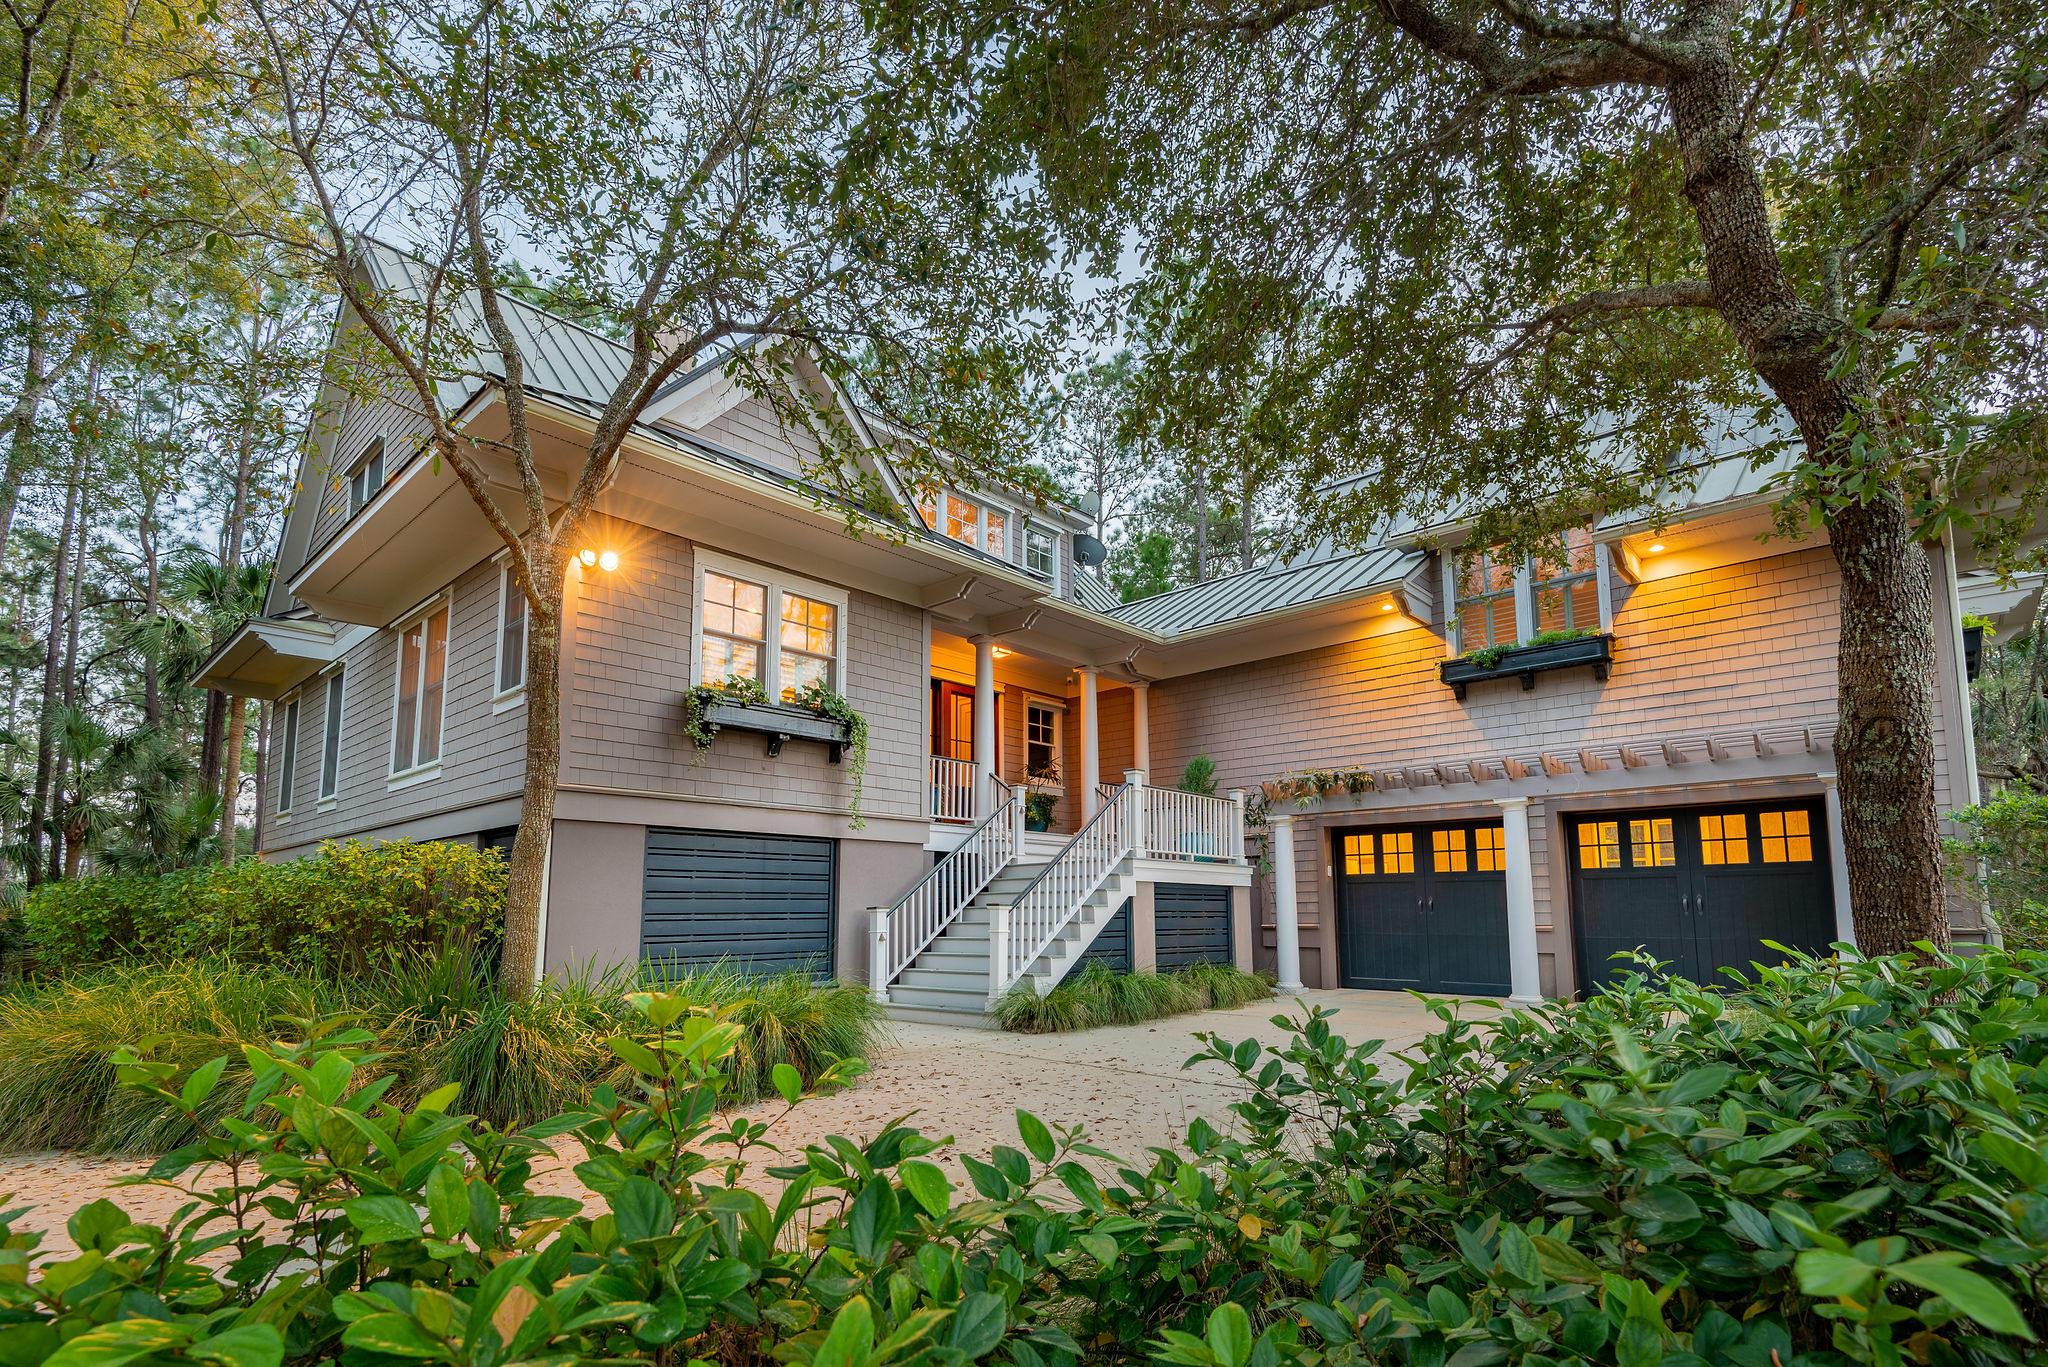 Kiawah Island Homes For Sale - 3 Grey Widgeon, Kiawah Island, SC - 72